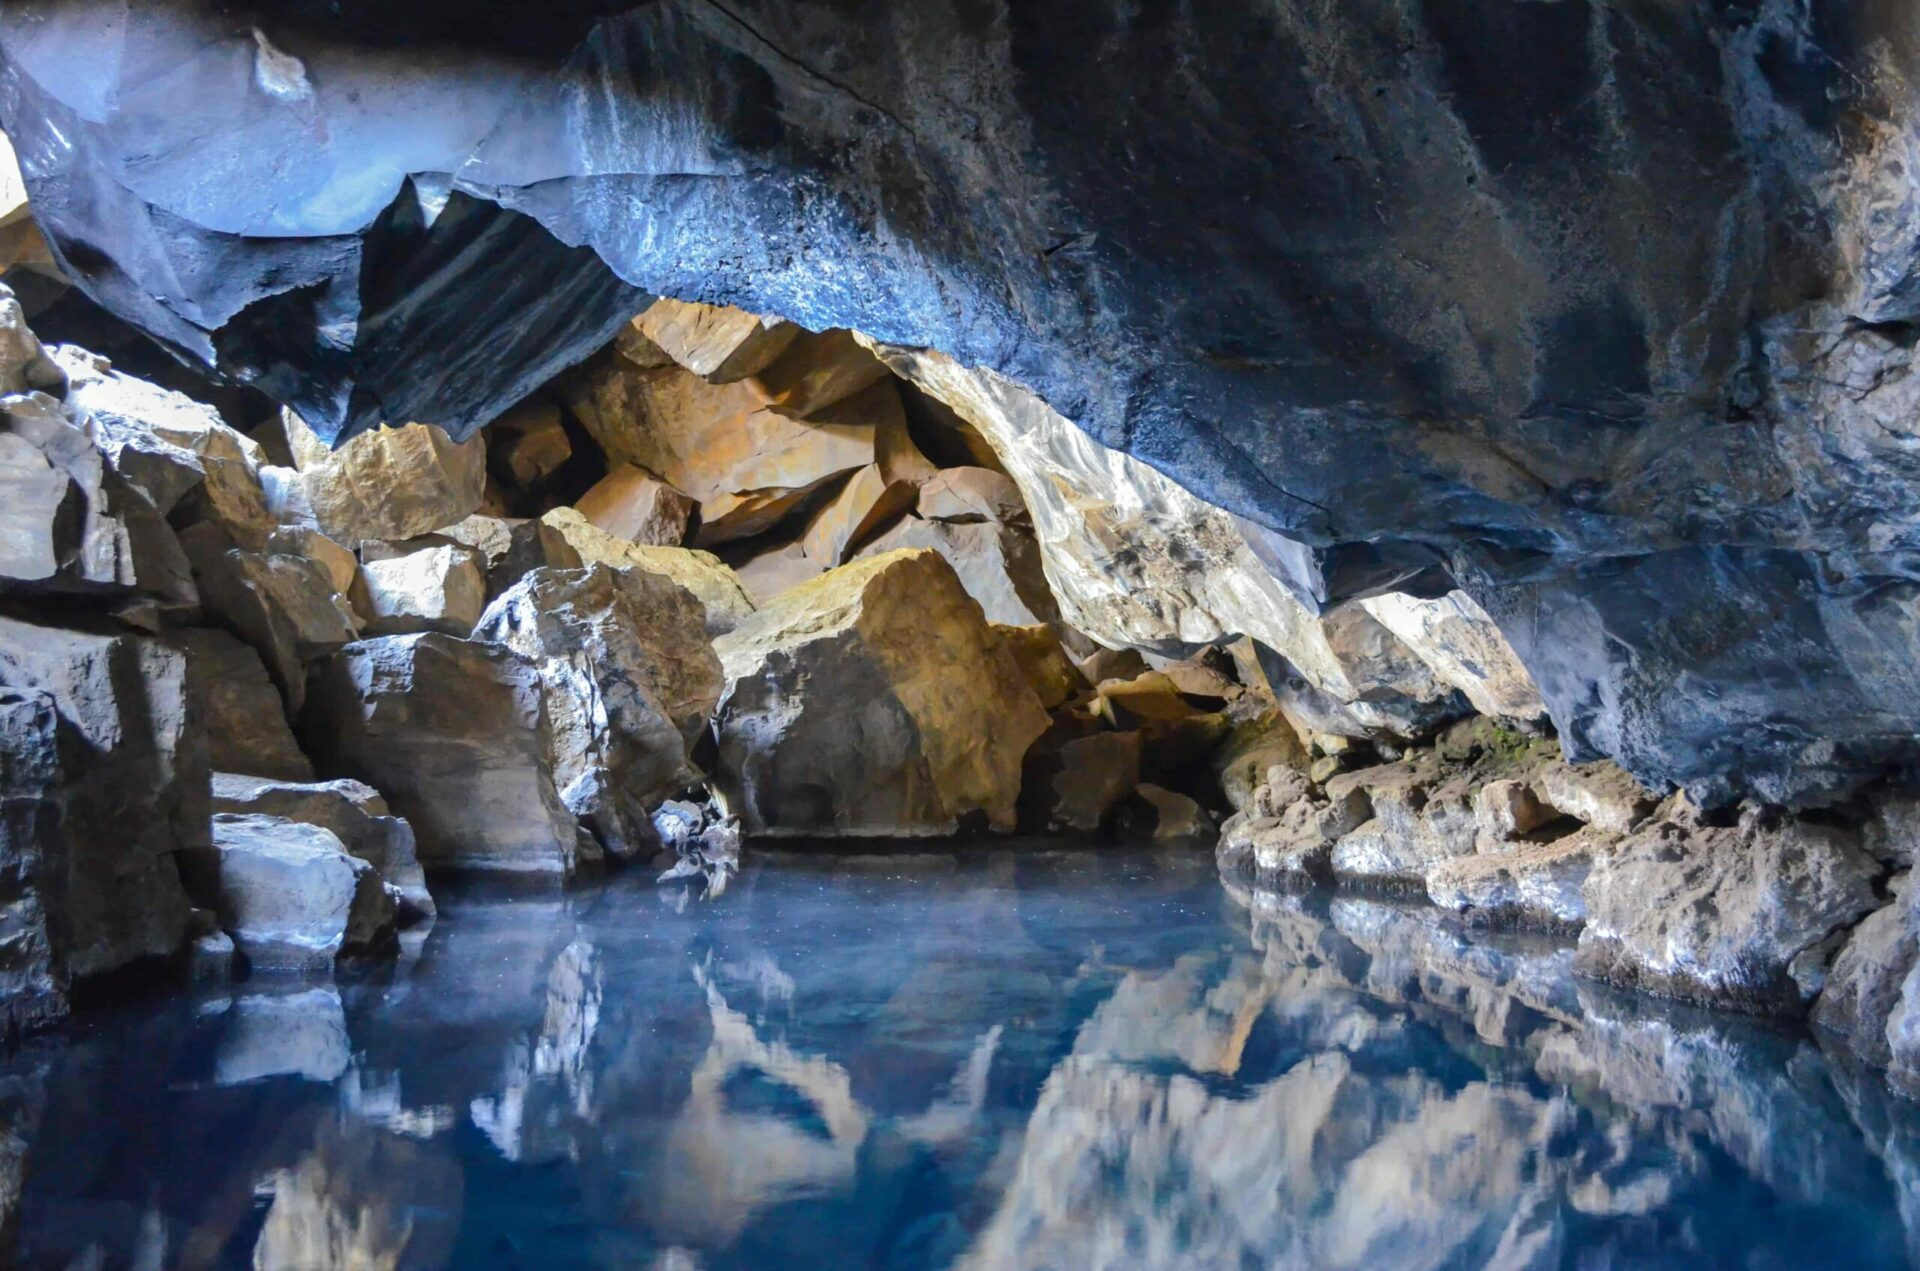 Grjótagjá hot spring cave in north Iceland